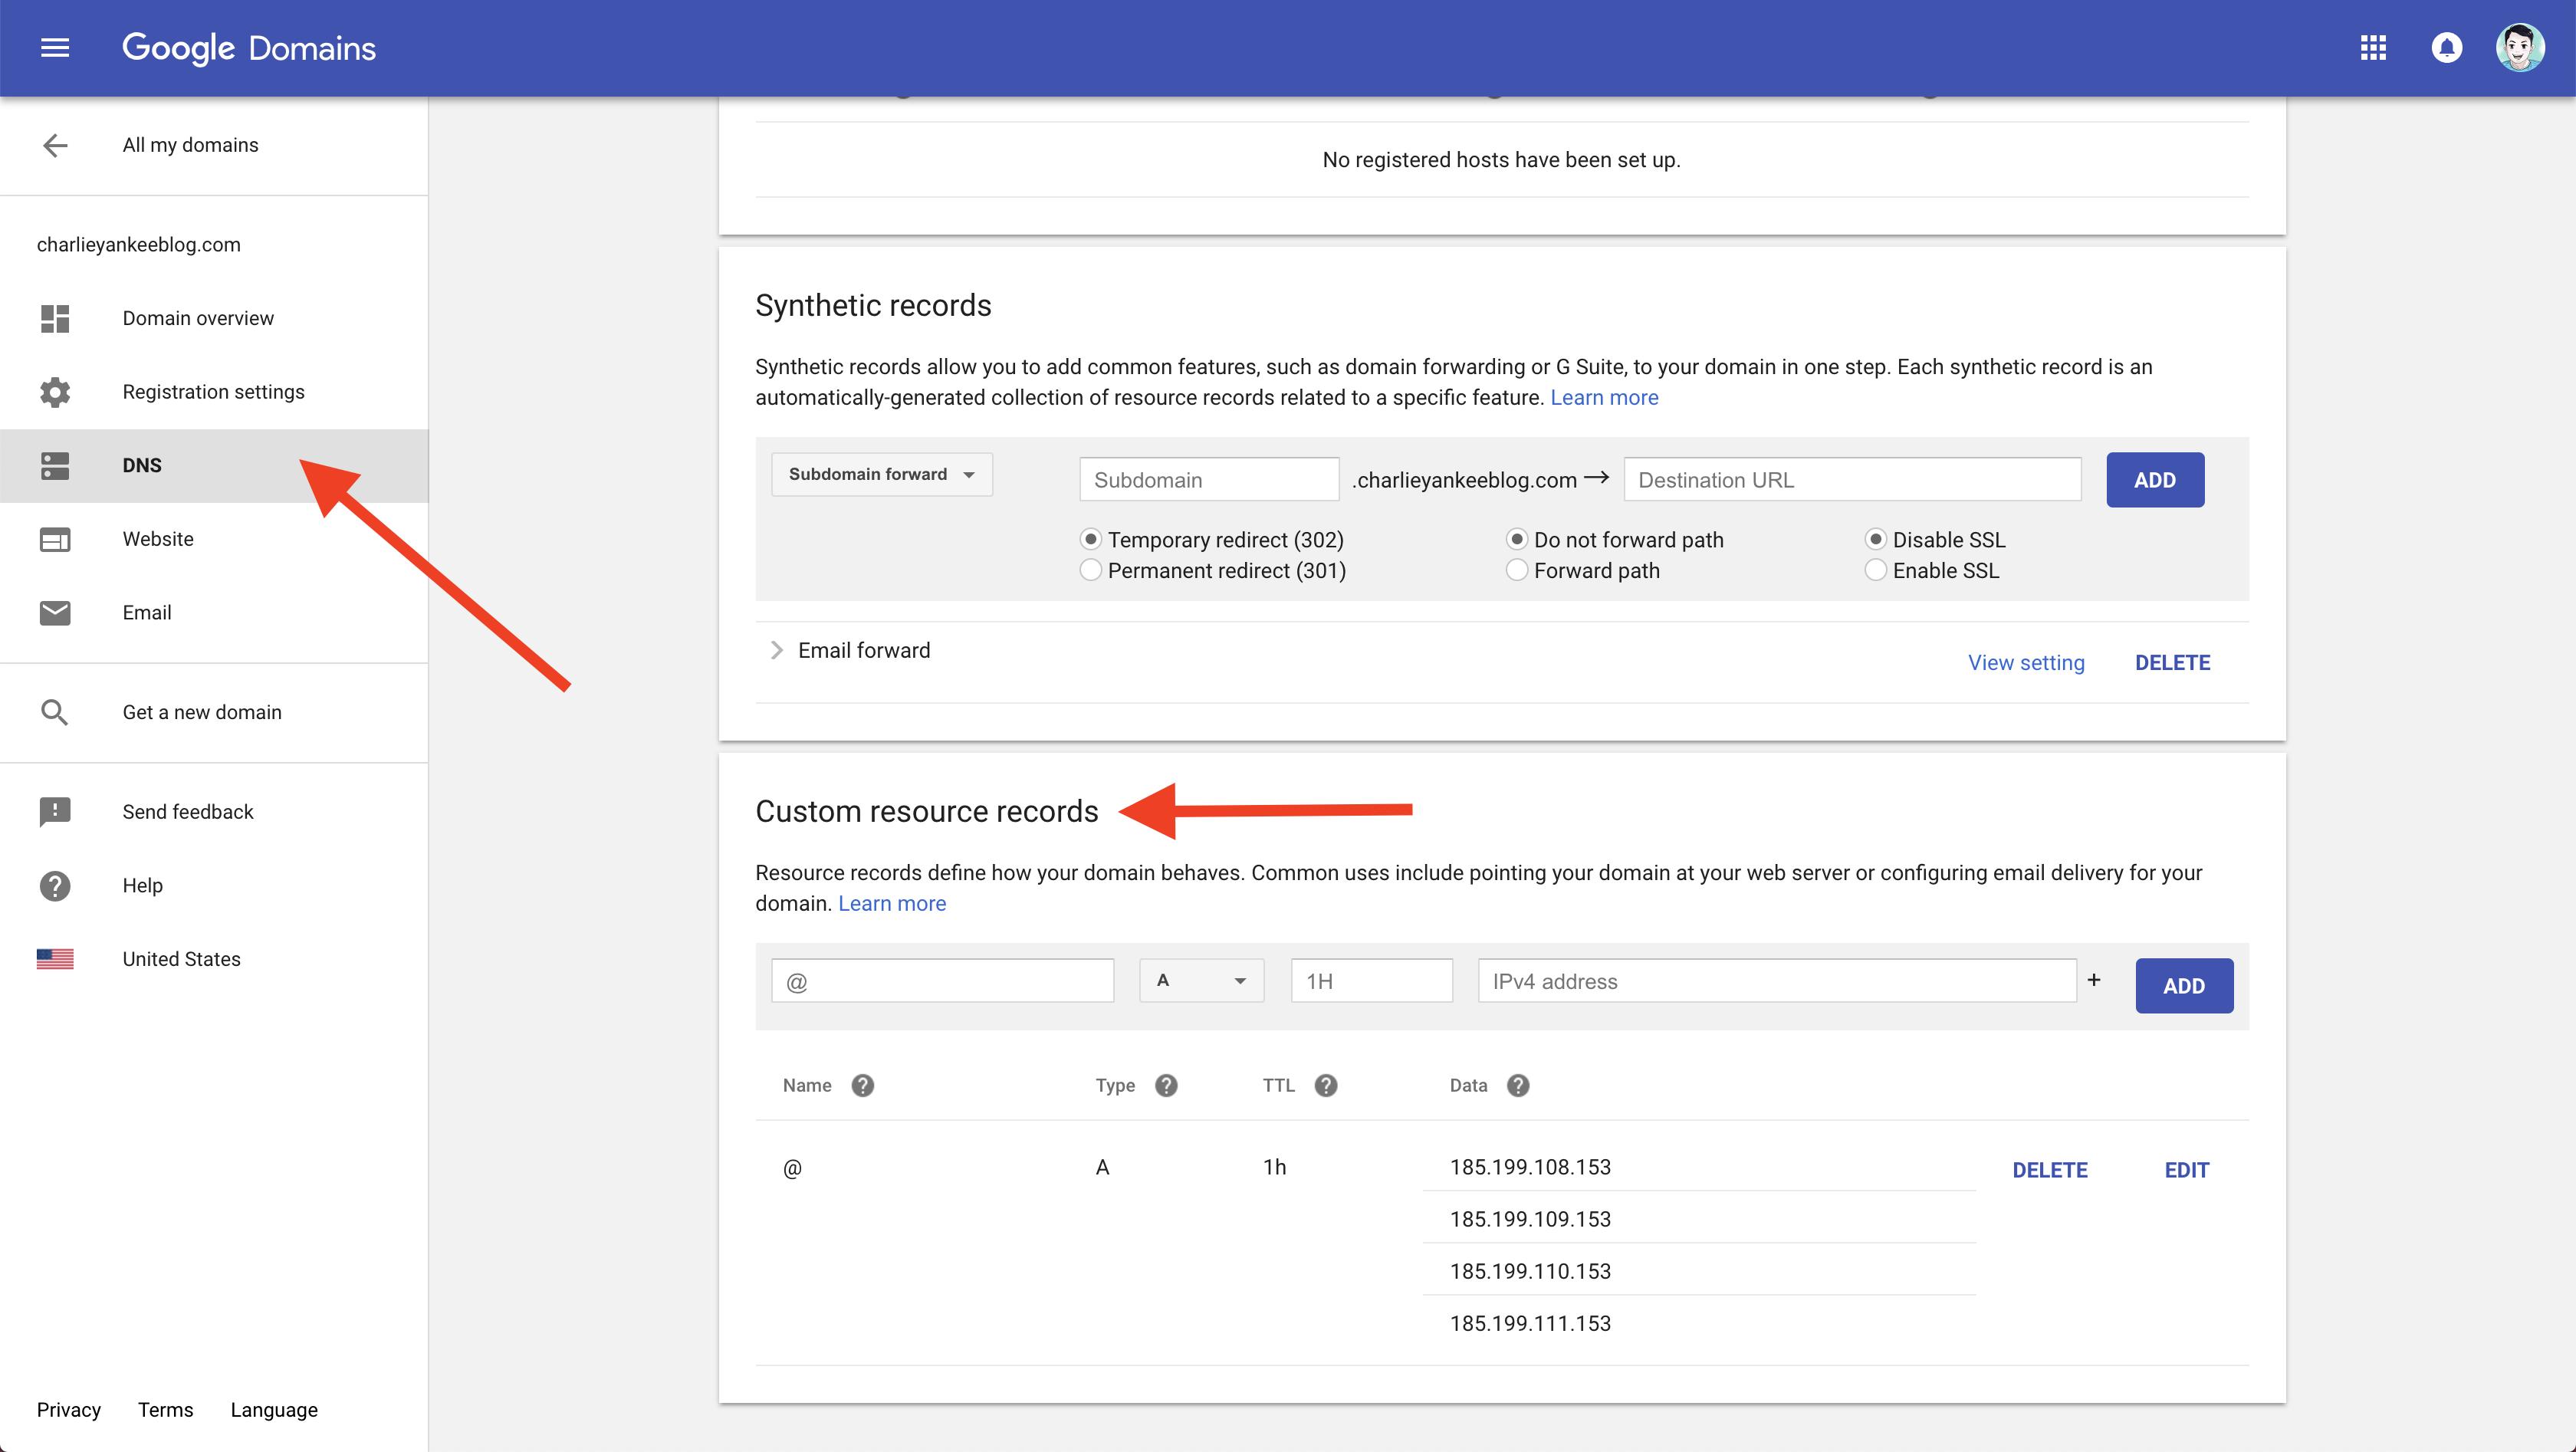 DNS Custom resource records